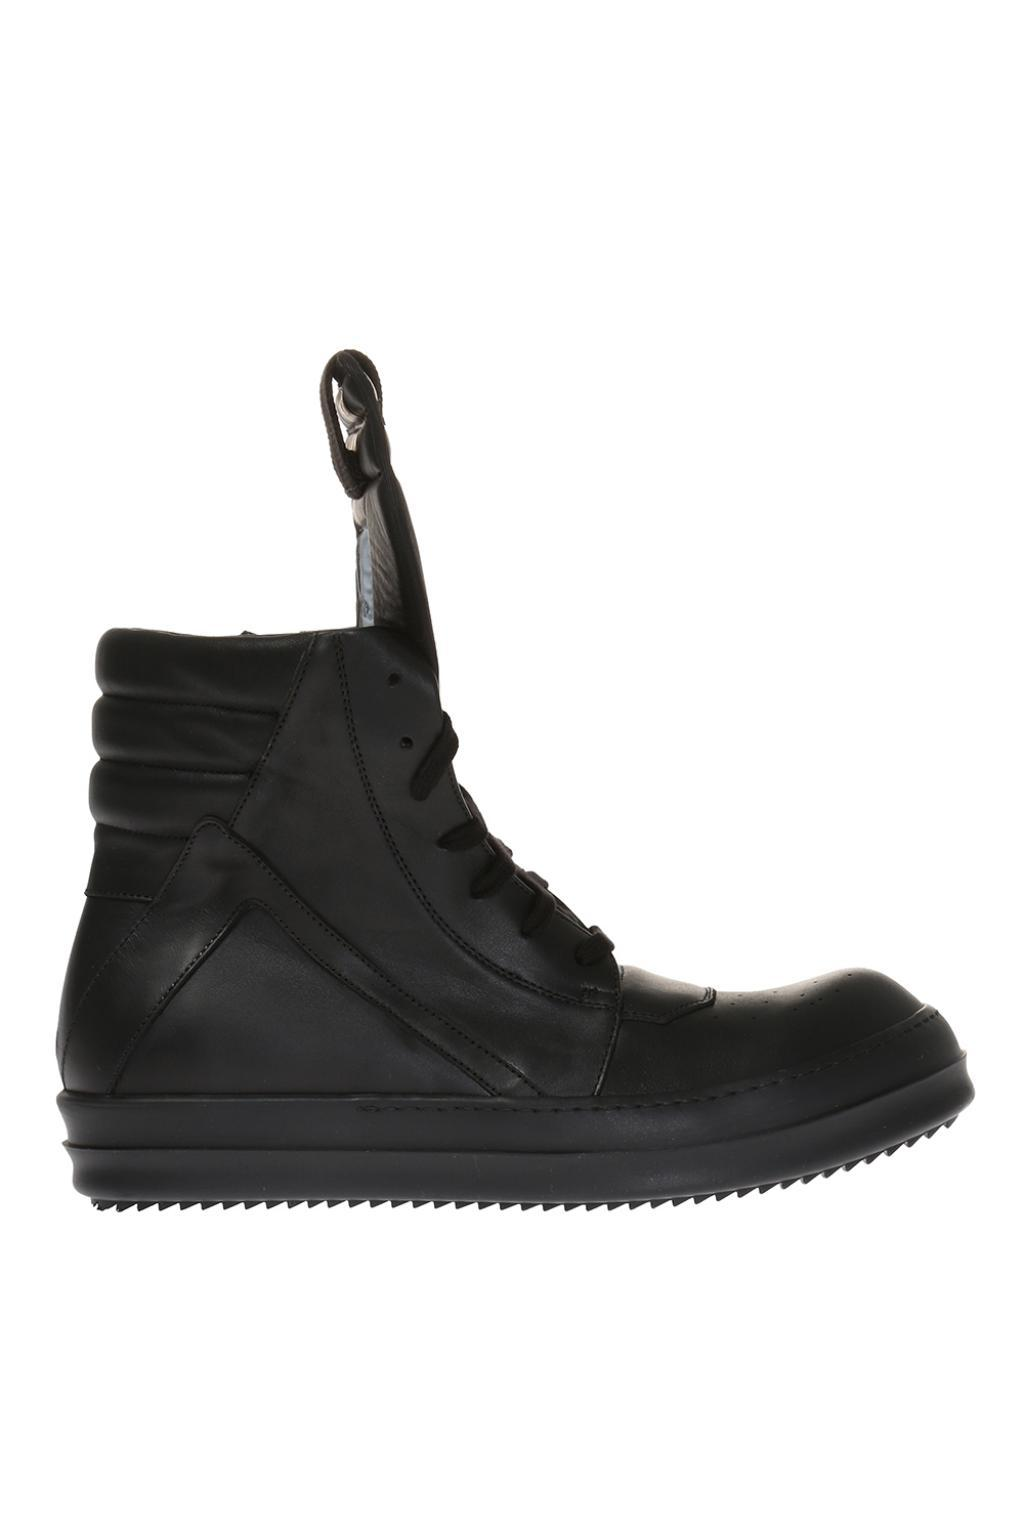 Rick Owens High-top Sneakers in Black for Men - Lyst b8ceb8d59